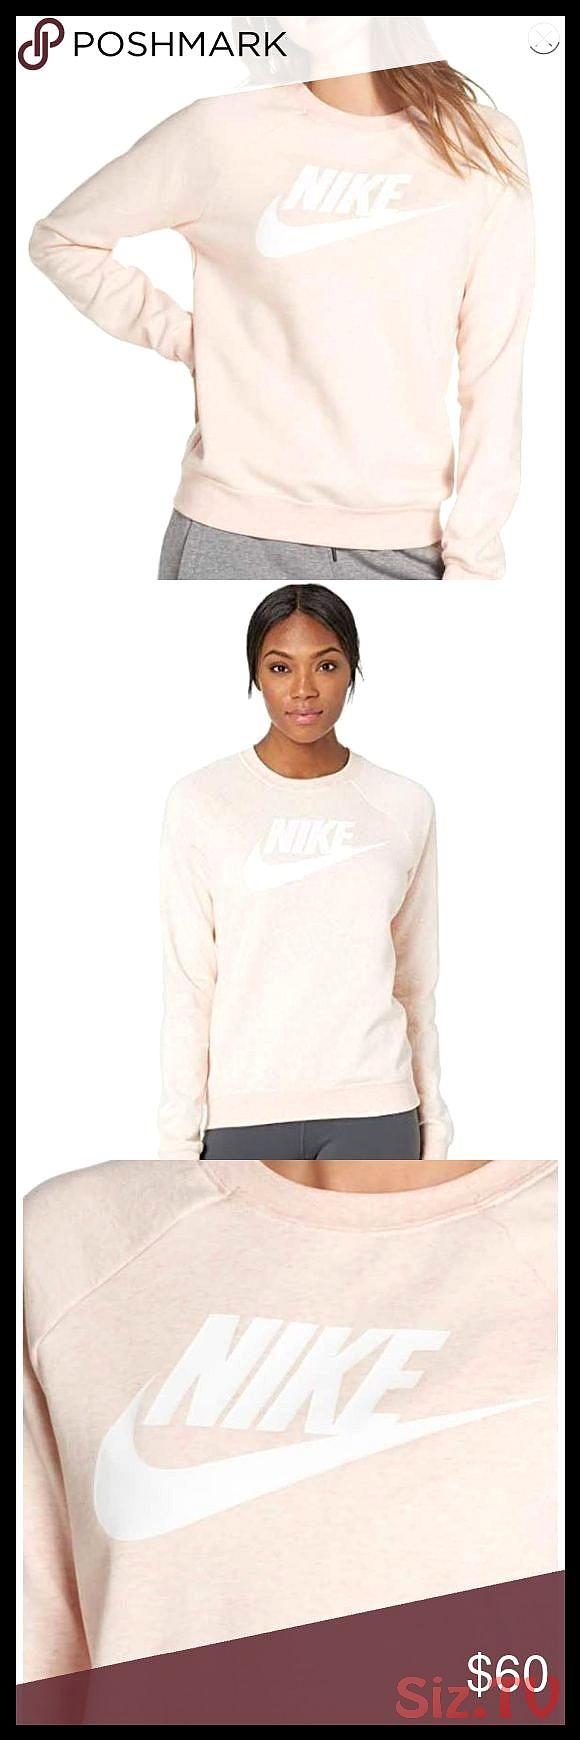 Nike Sweatshirt New W Tags Still Attached Soft Midweight Fleece Brings A Vintage Feel To This Nike Sportswear Sweat Nike Sweatshirts Clothes Design Sweatshirts [ 1740 x 580 Pixel ]